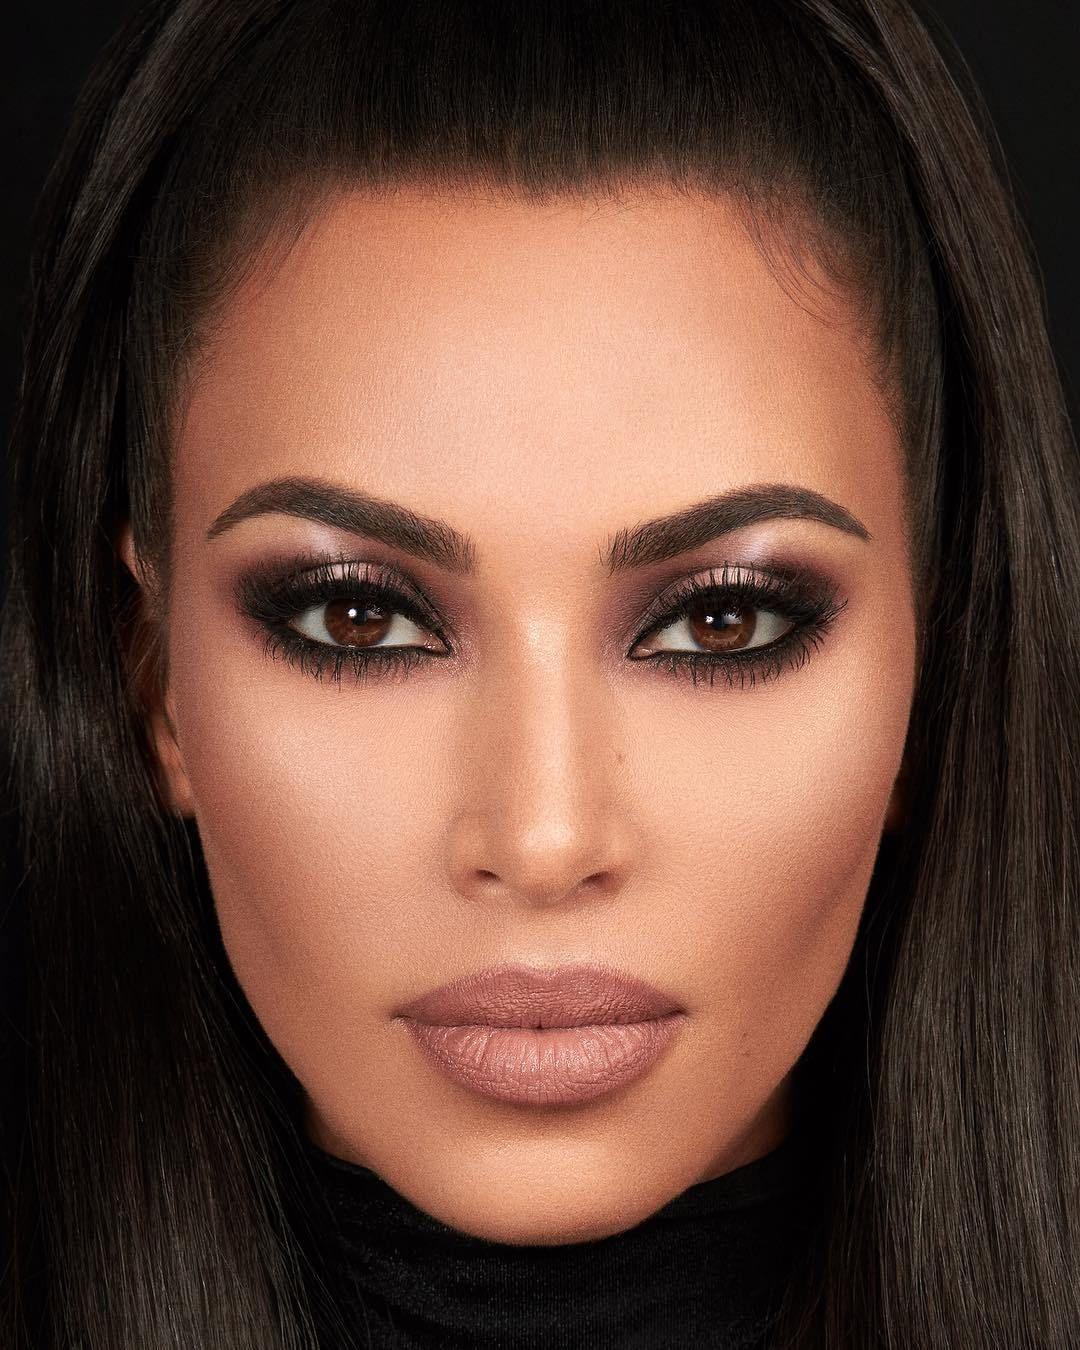 Tem make inédito chegando na KKW Beauty, marca da Kim Kardashian!